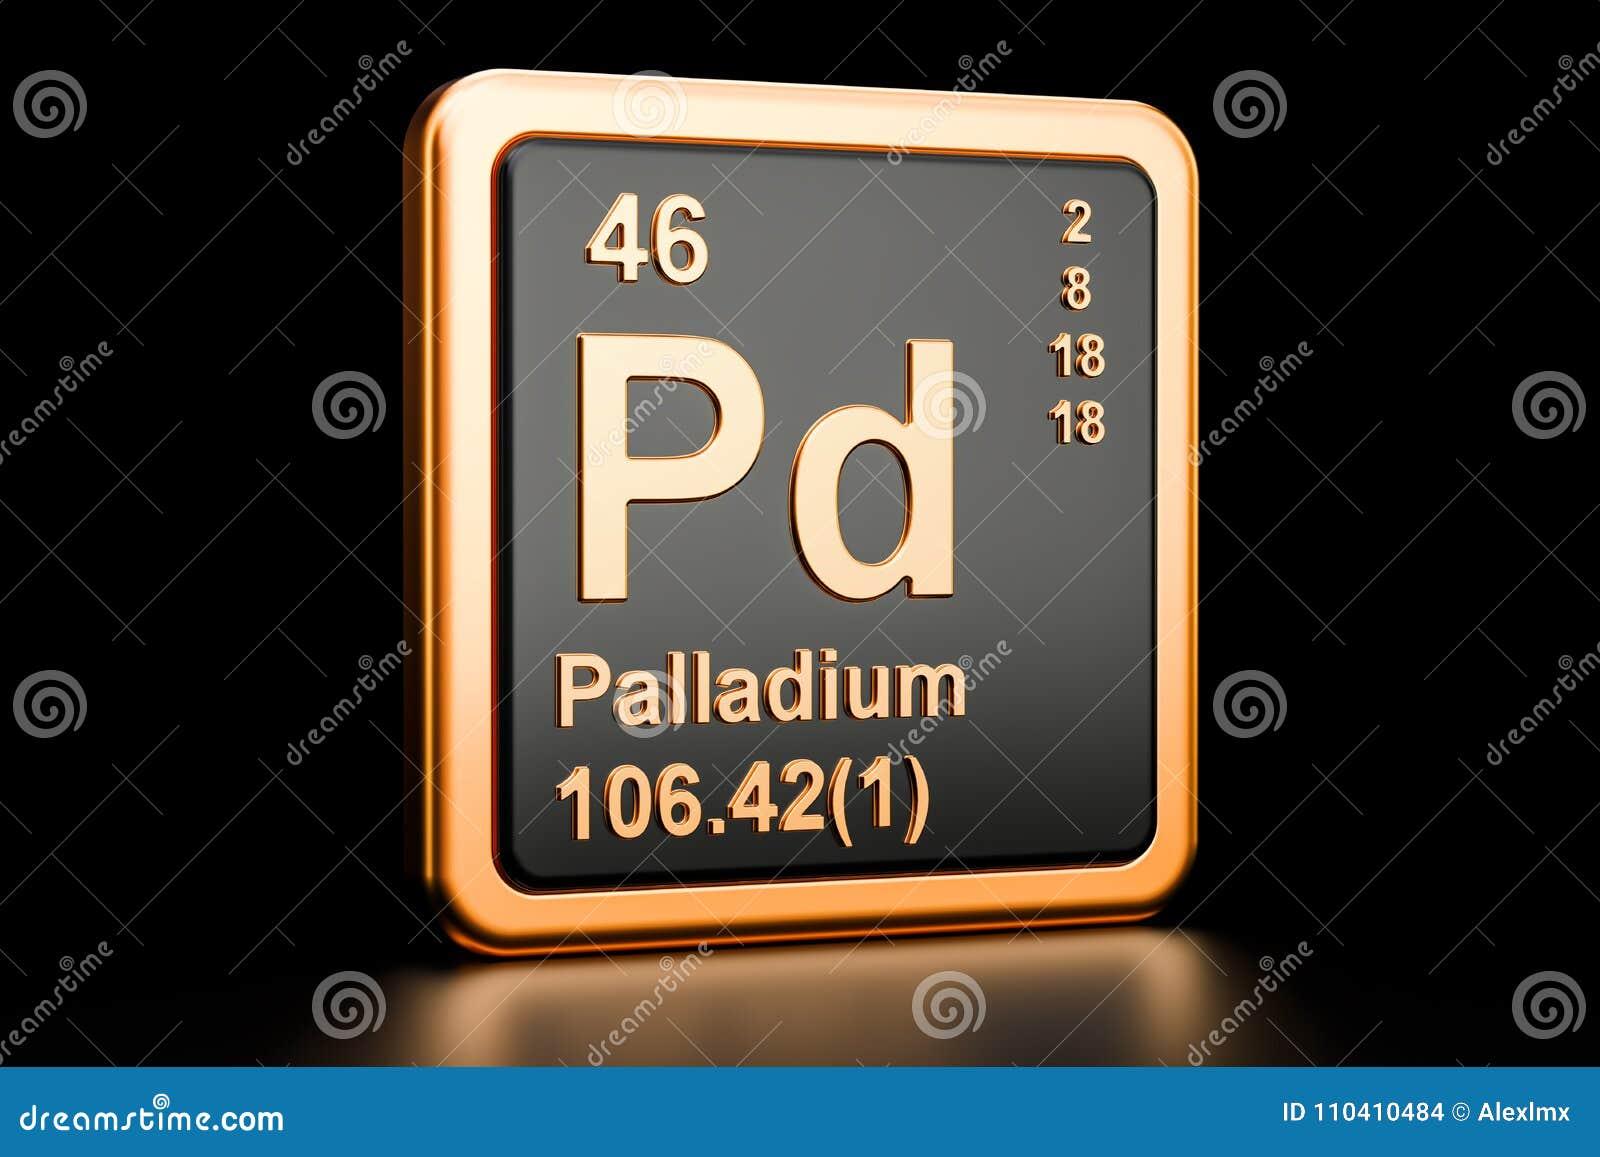 Palladium Pd Chemical Element 3d Rendering Stock Illustration